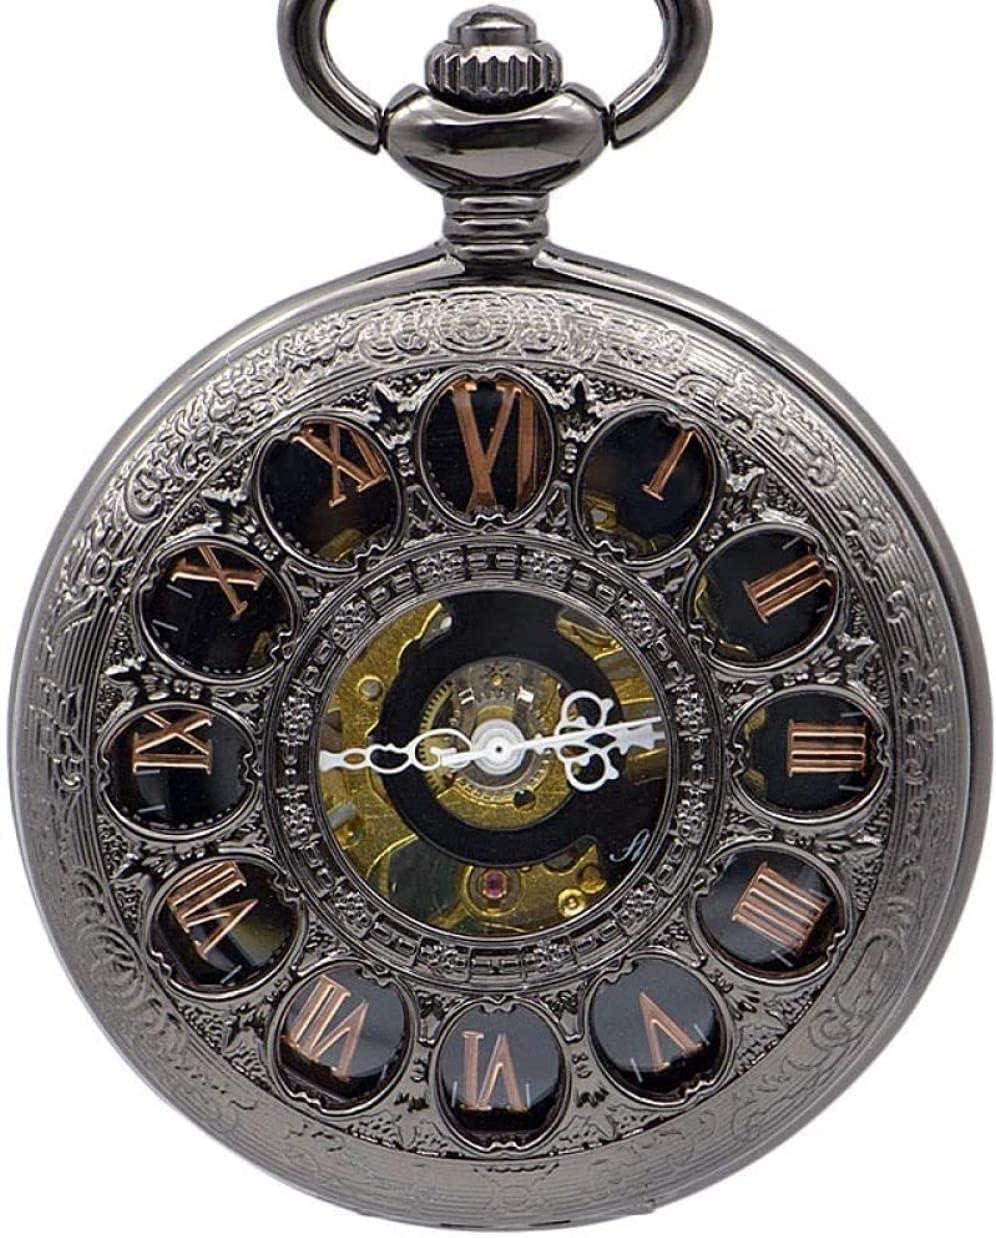 JZDH Relojes de Bolsillo Reloj de Bolsillo de Cuarzo, Reloj de antigüedades del Collar Antiguo de los Hombres de los Hombres del Esqueleto Antiguo